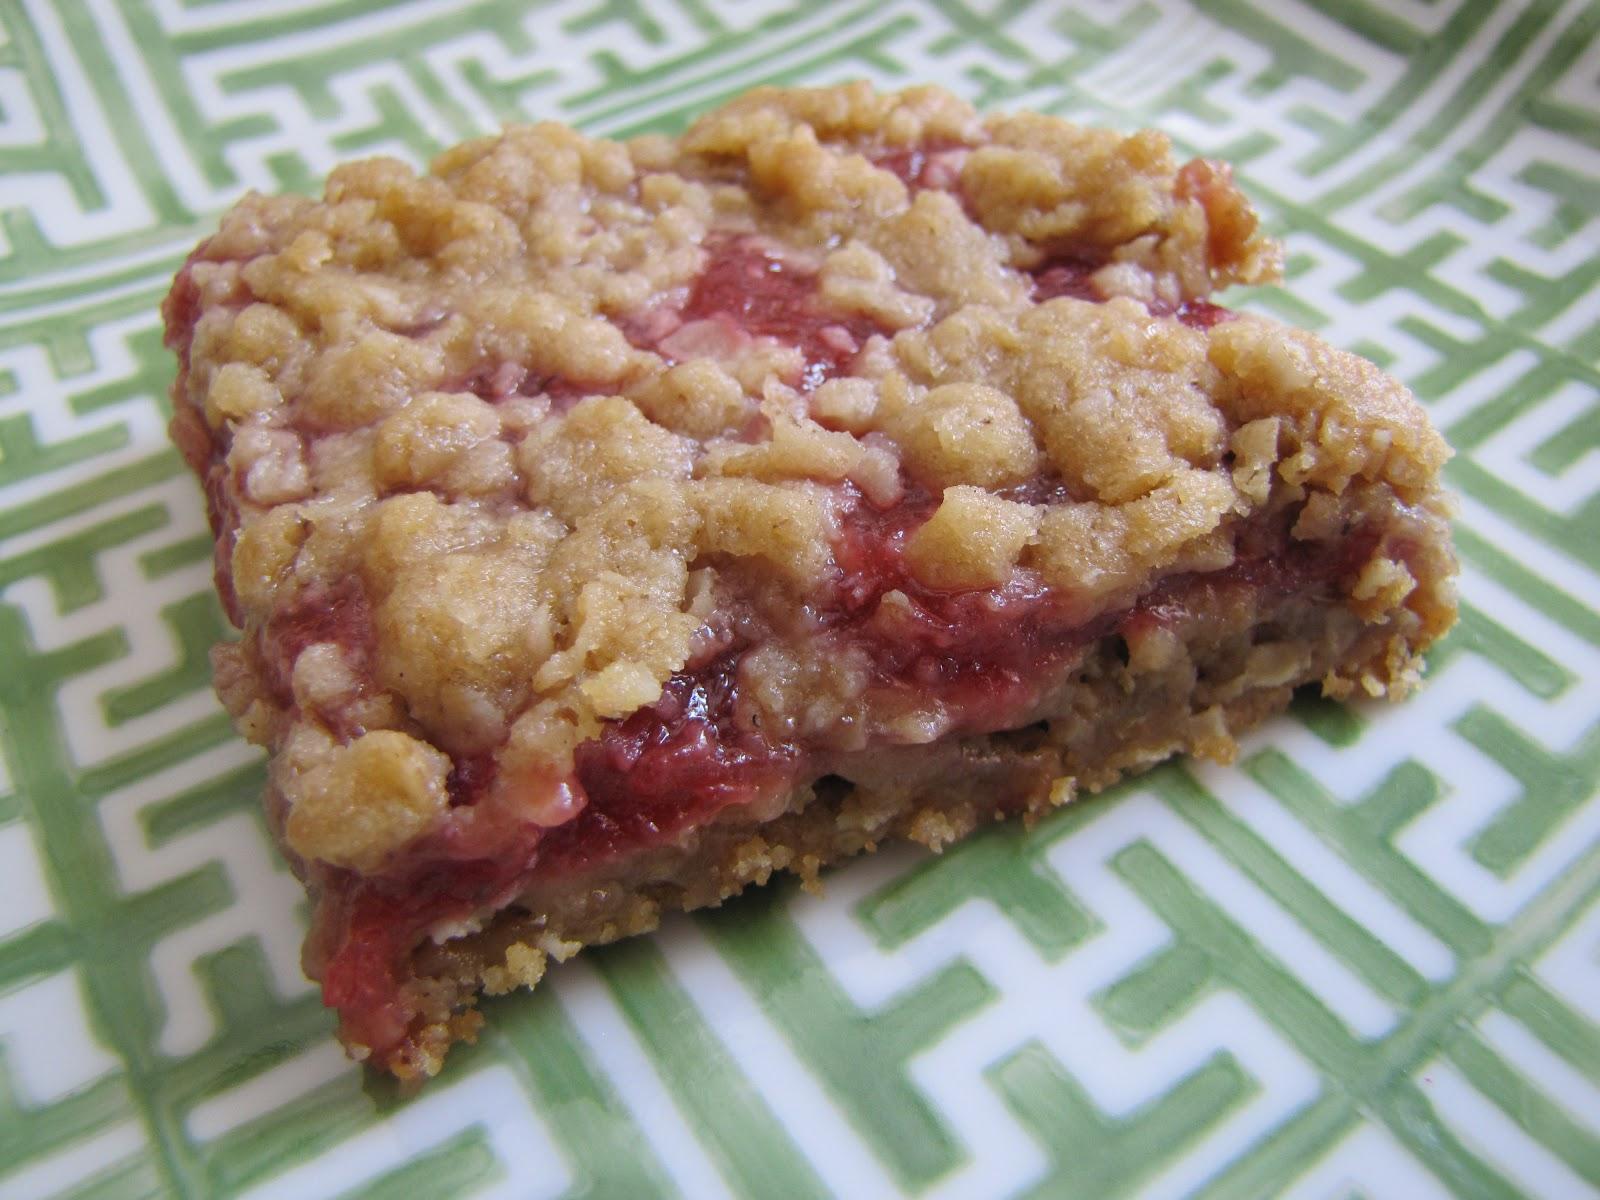 Adventures in Food: Strawberry- Rhubarb Oatmeal Bars